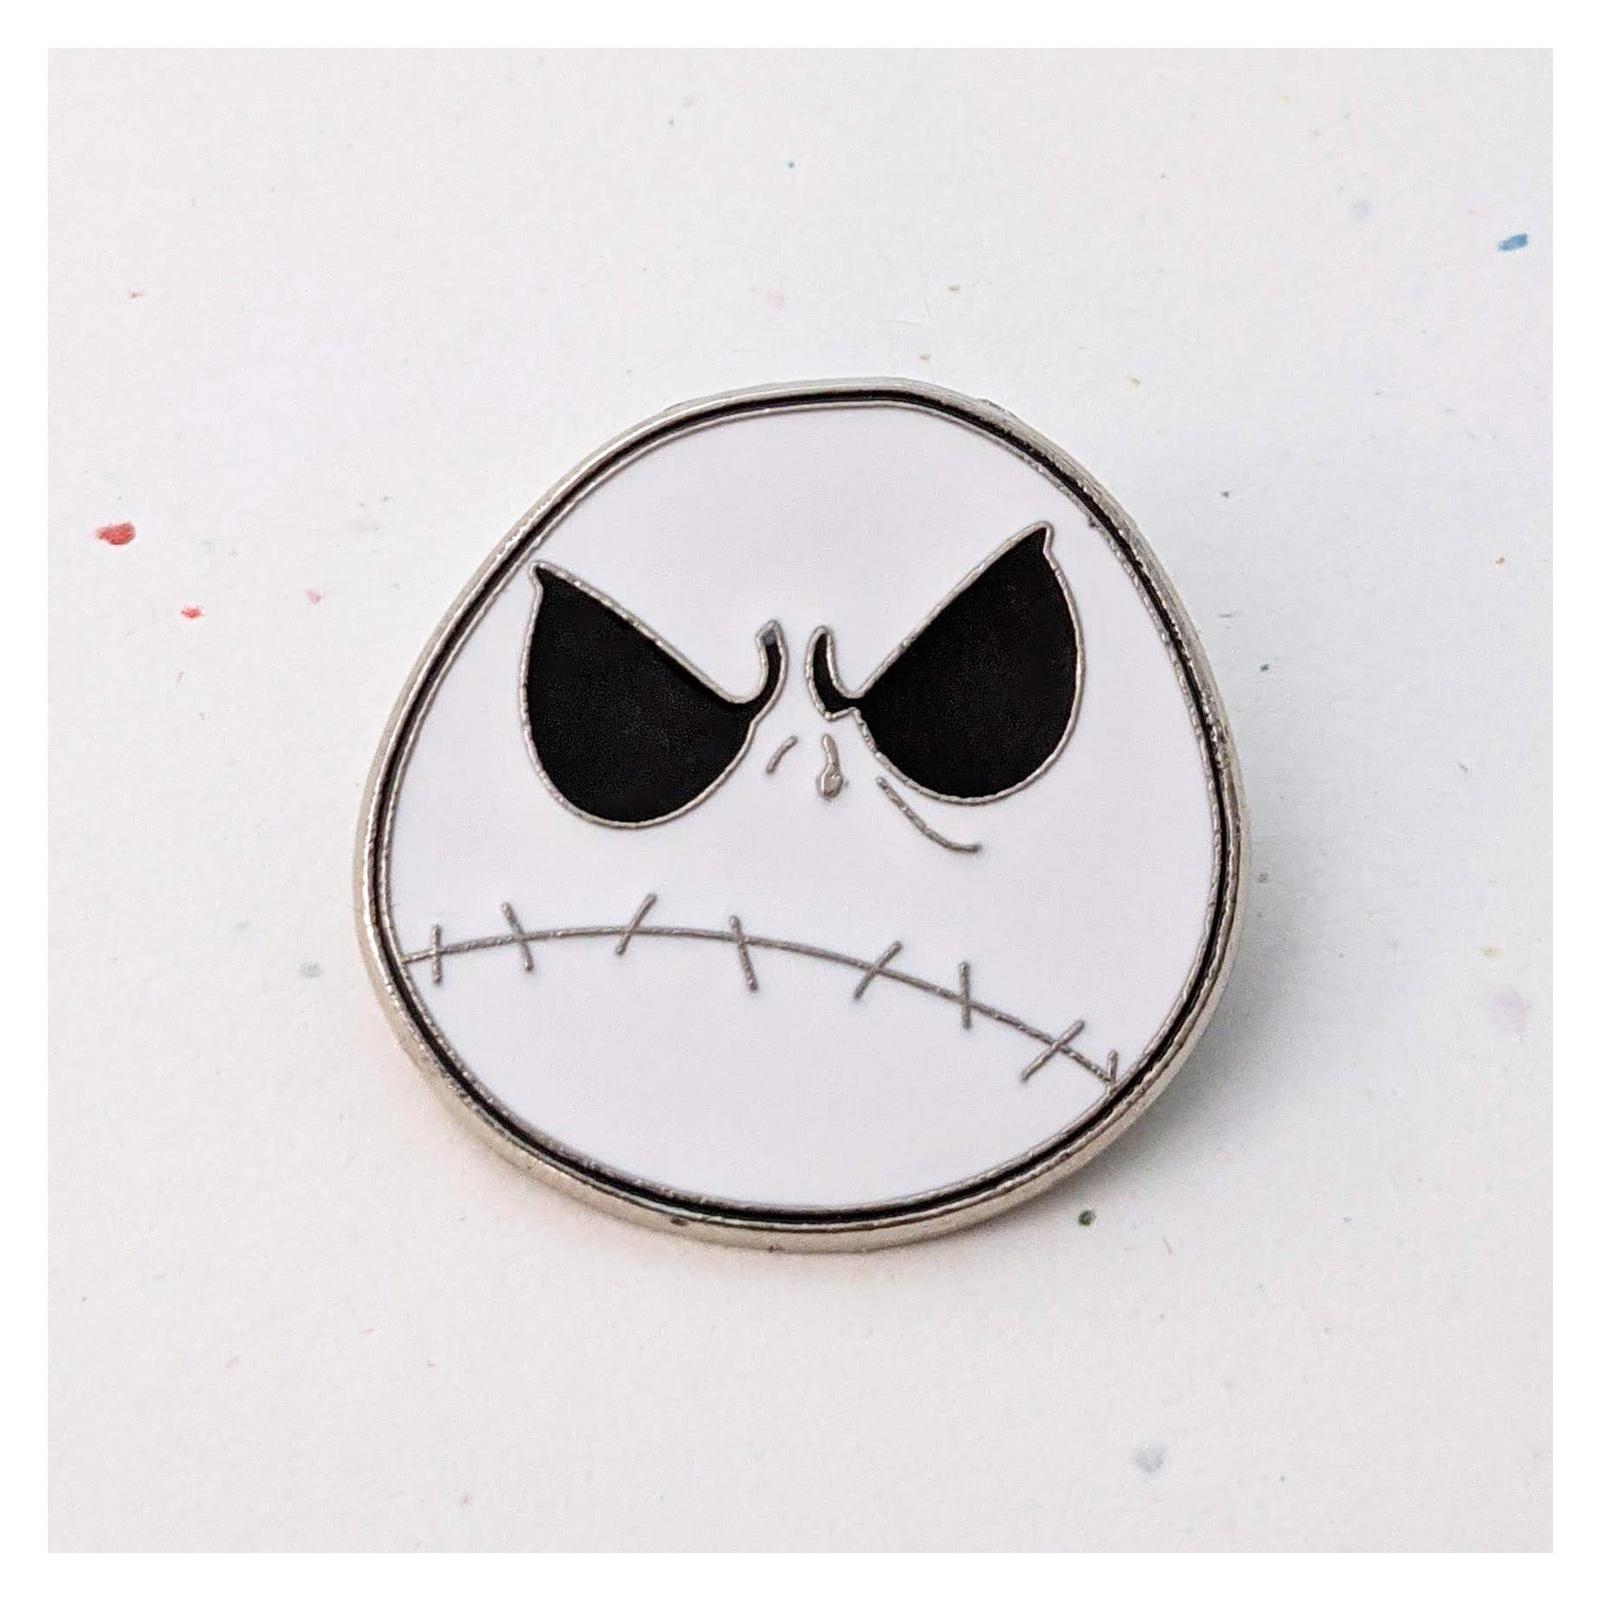 Nightmare Before Christmas Disney Lapel Pin: Jack Skellington Frowning - $9.90